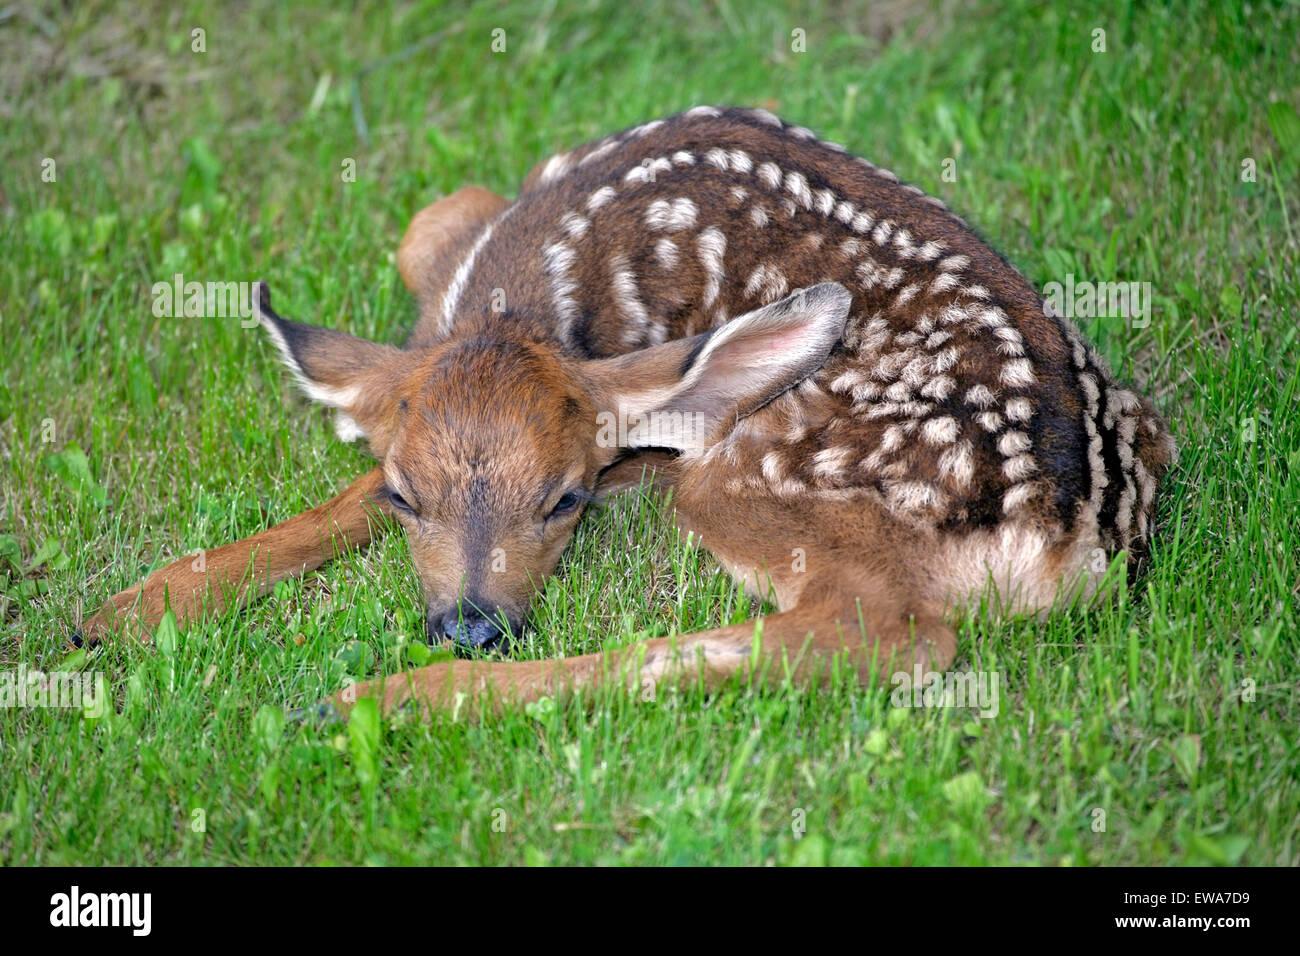 Mule Deer Fawn, few days old resting in grass (Odocoileus hemionus ) - Stock Image